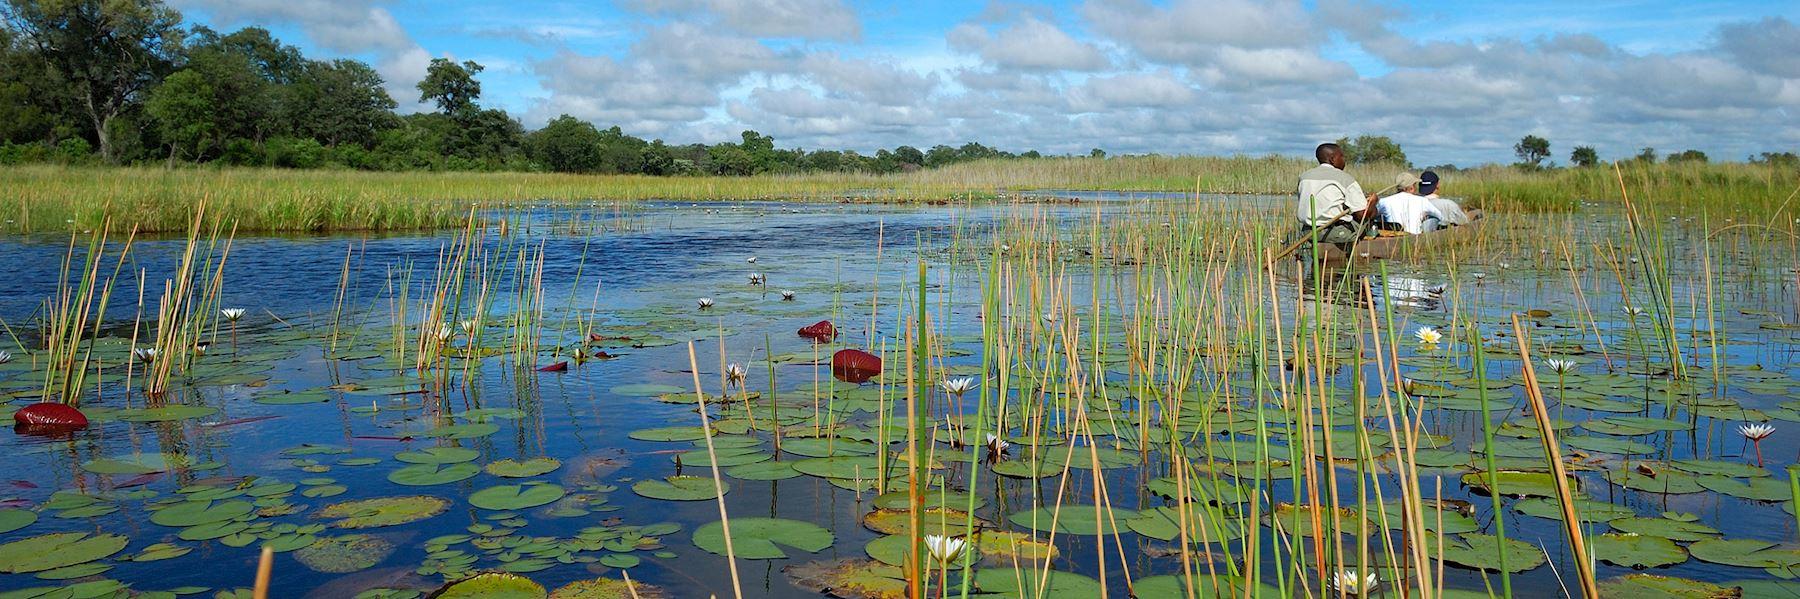 Visit the Okavango Delta, Botswana